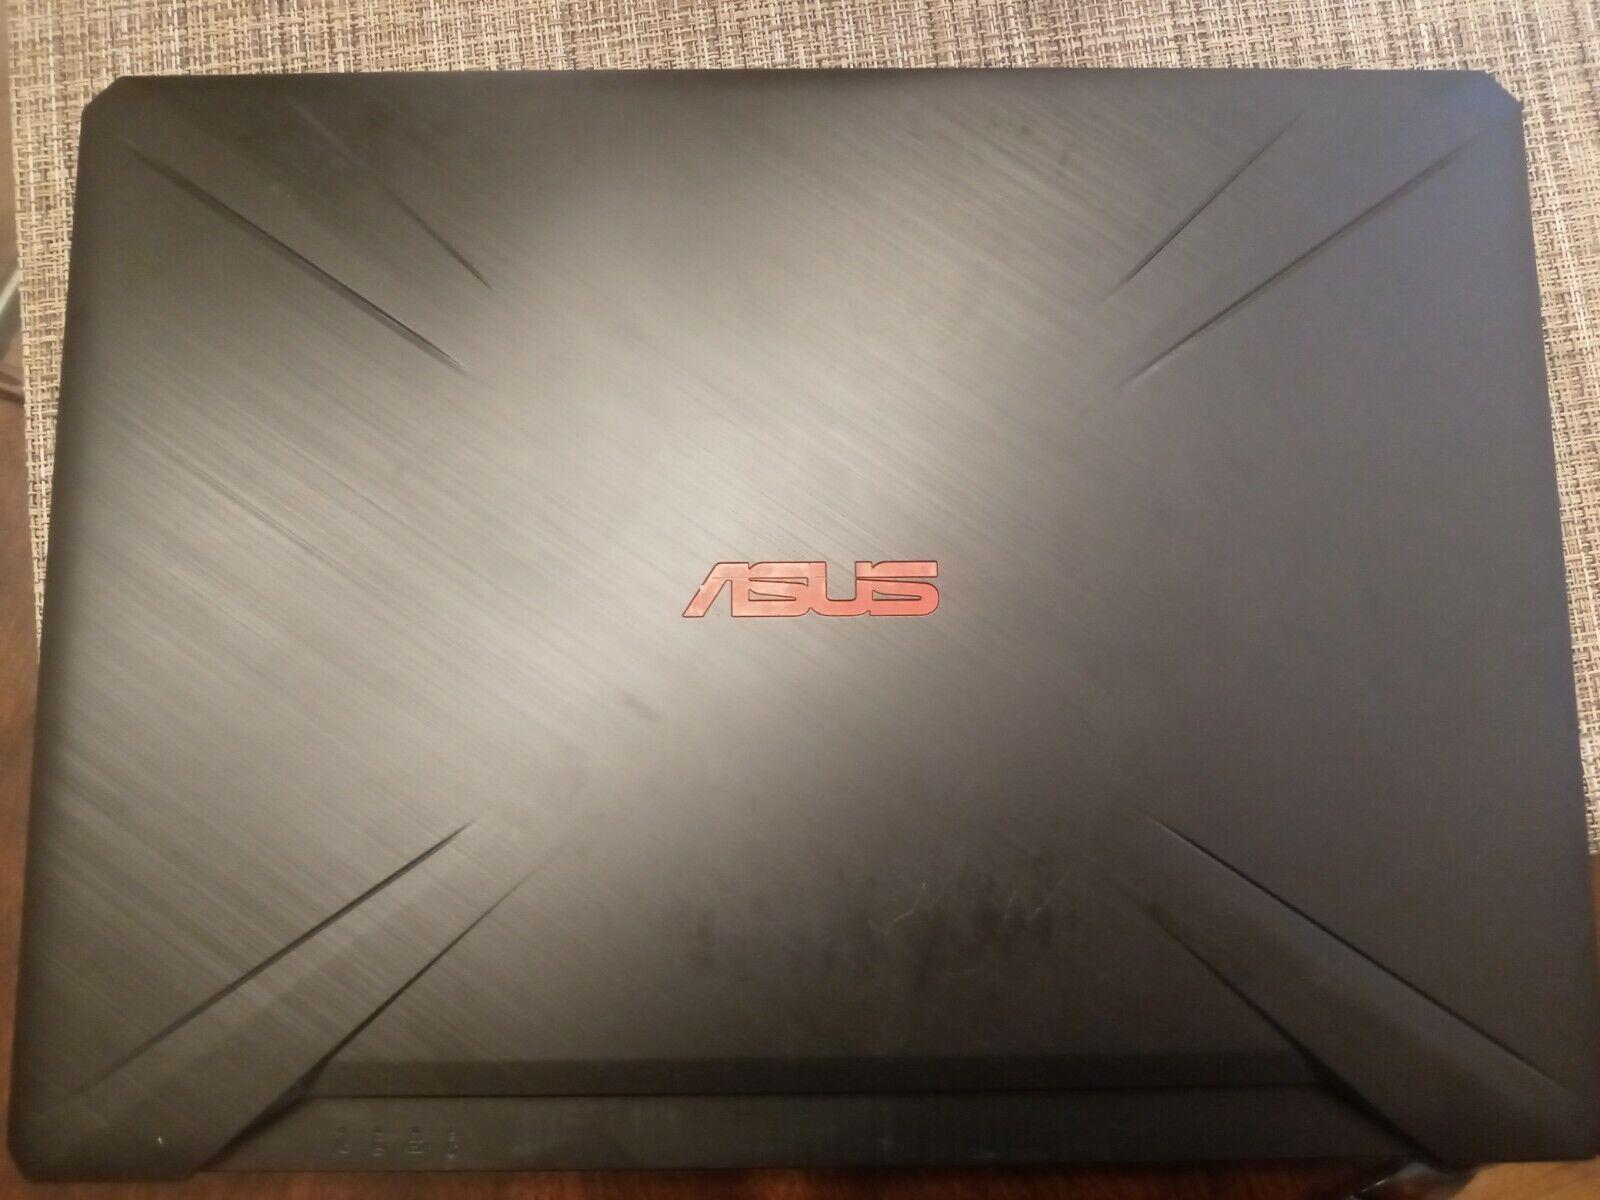 ASUS TUF Gaming Laptop FX505DY AMD Ryzen 5 AMD RX560X 16GB RAM 256GB SSD UPGRADE - $599.00